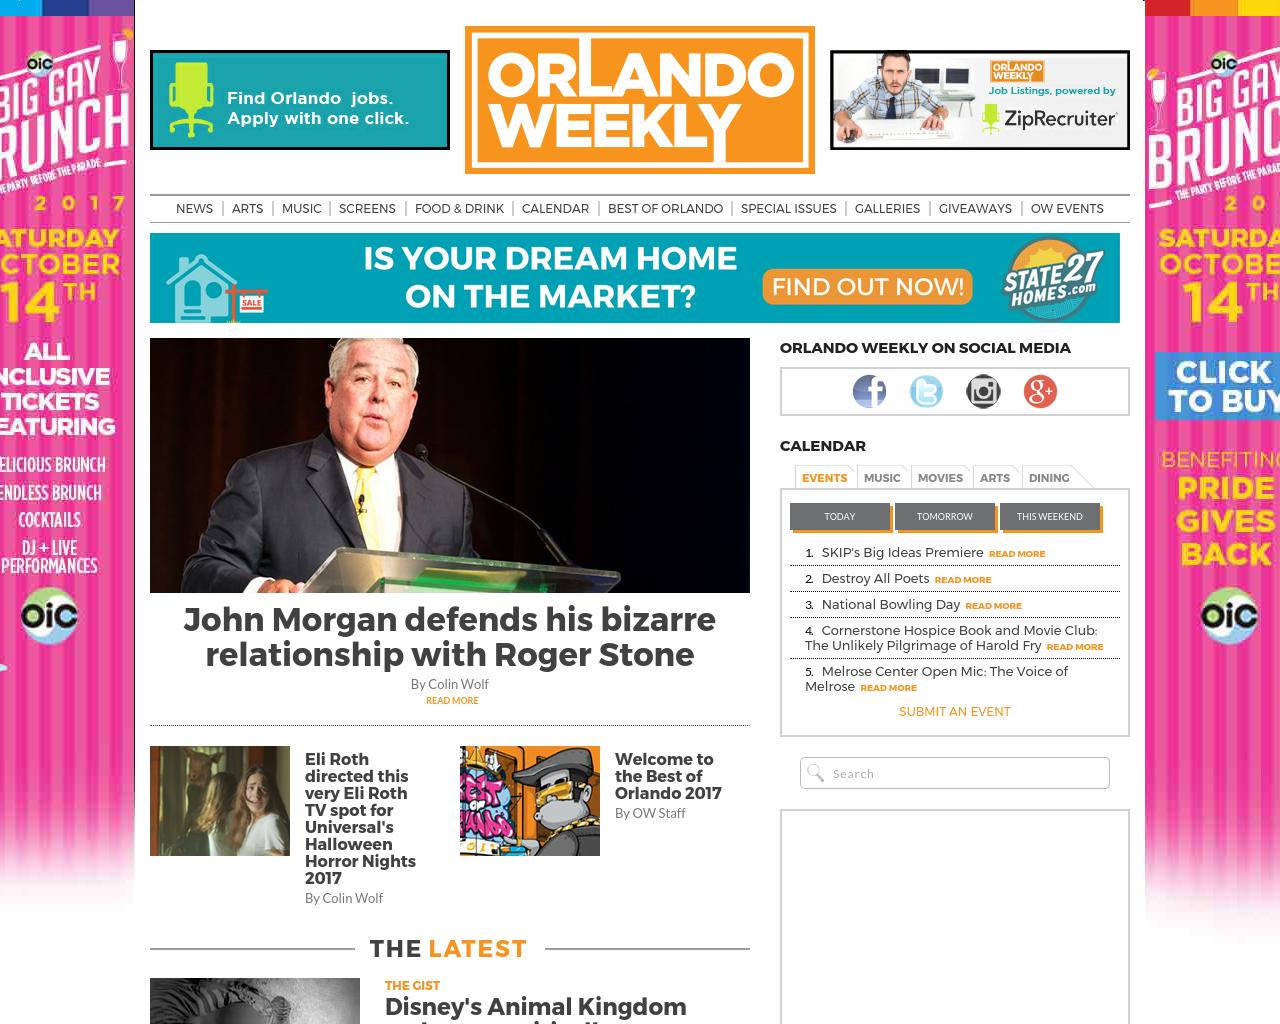 Orlando-Weekly-Advertising-Reviews-Pricing